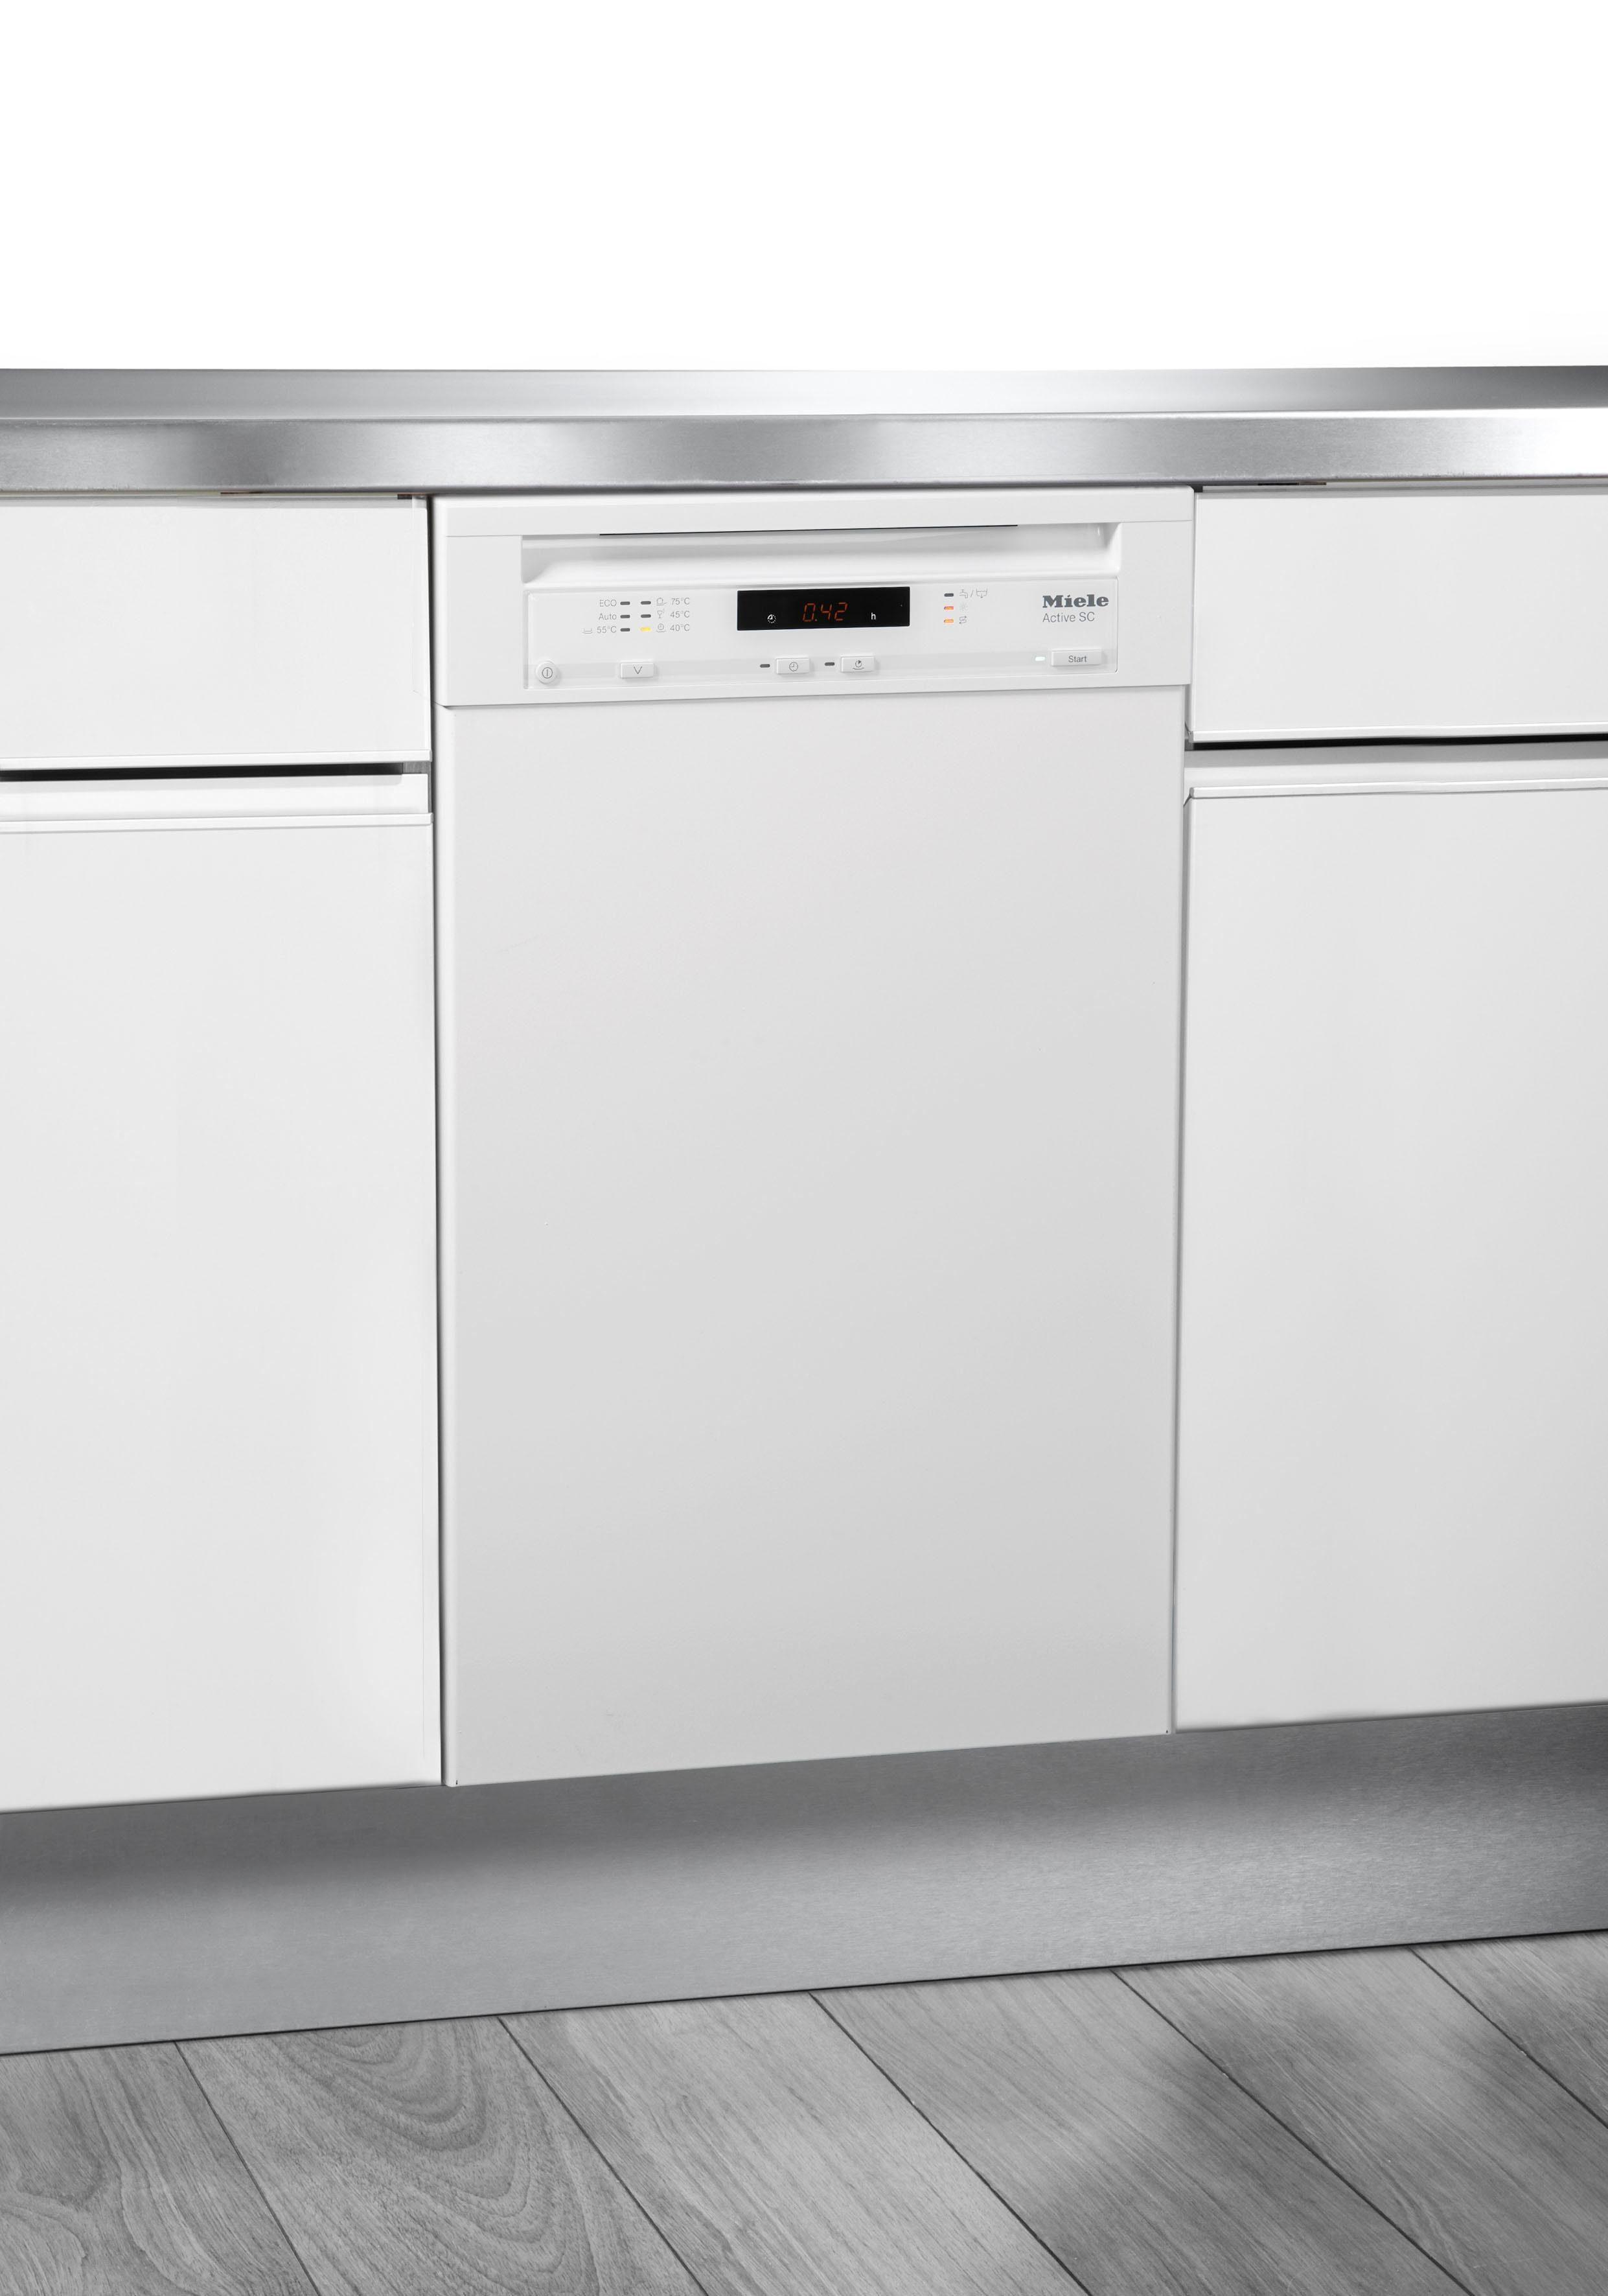 Miele Unterbaugeschirrspüler, G 4620 SCU brws, 0,87 l, 9 Maßgedecke, 45 cm breit